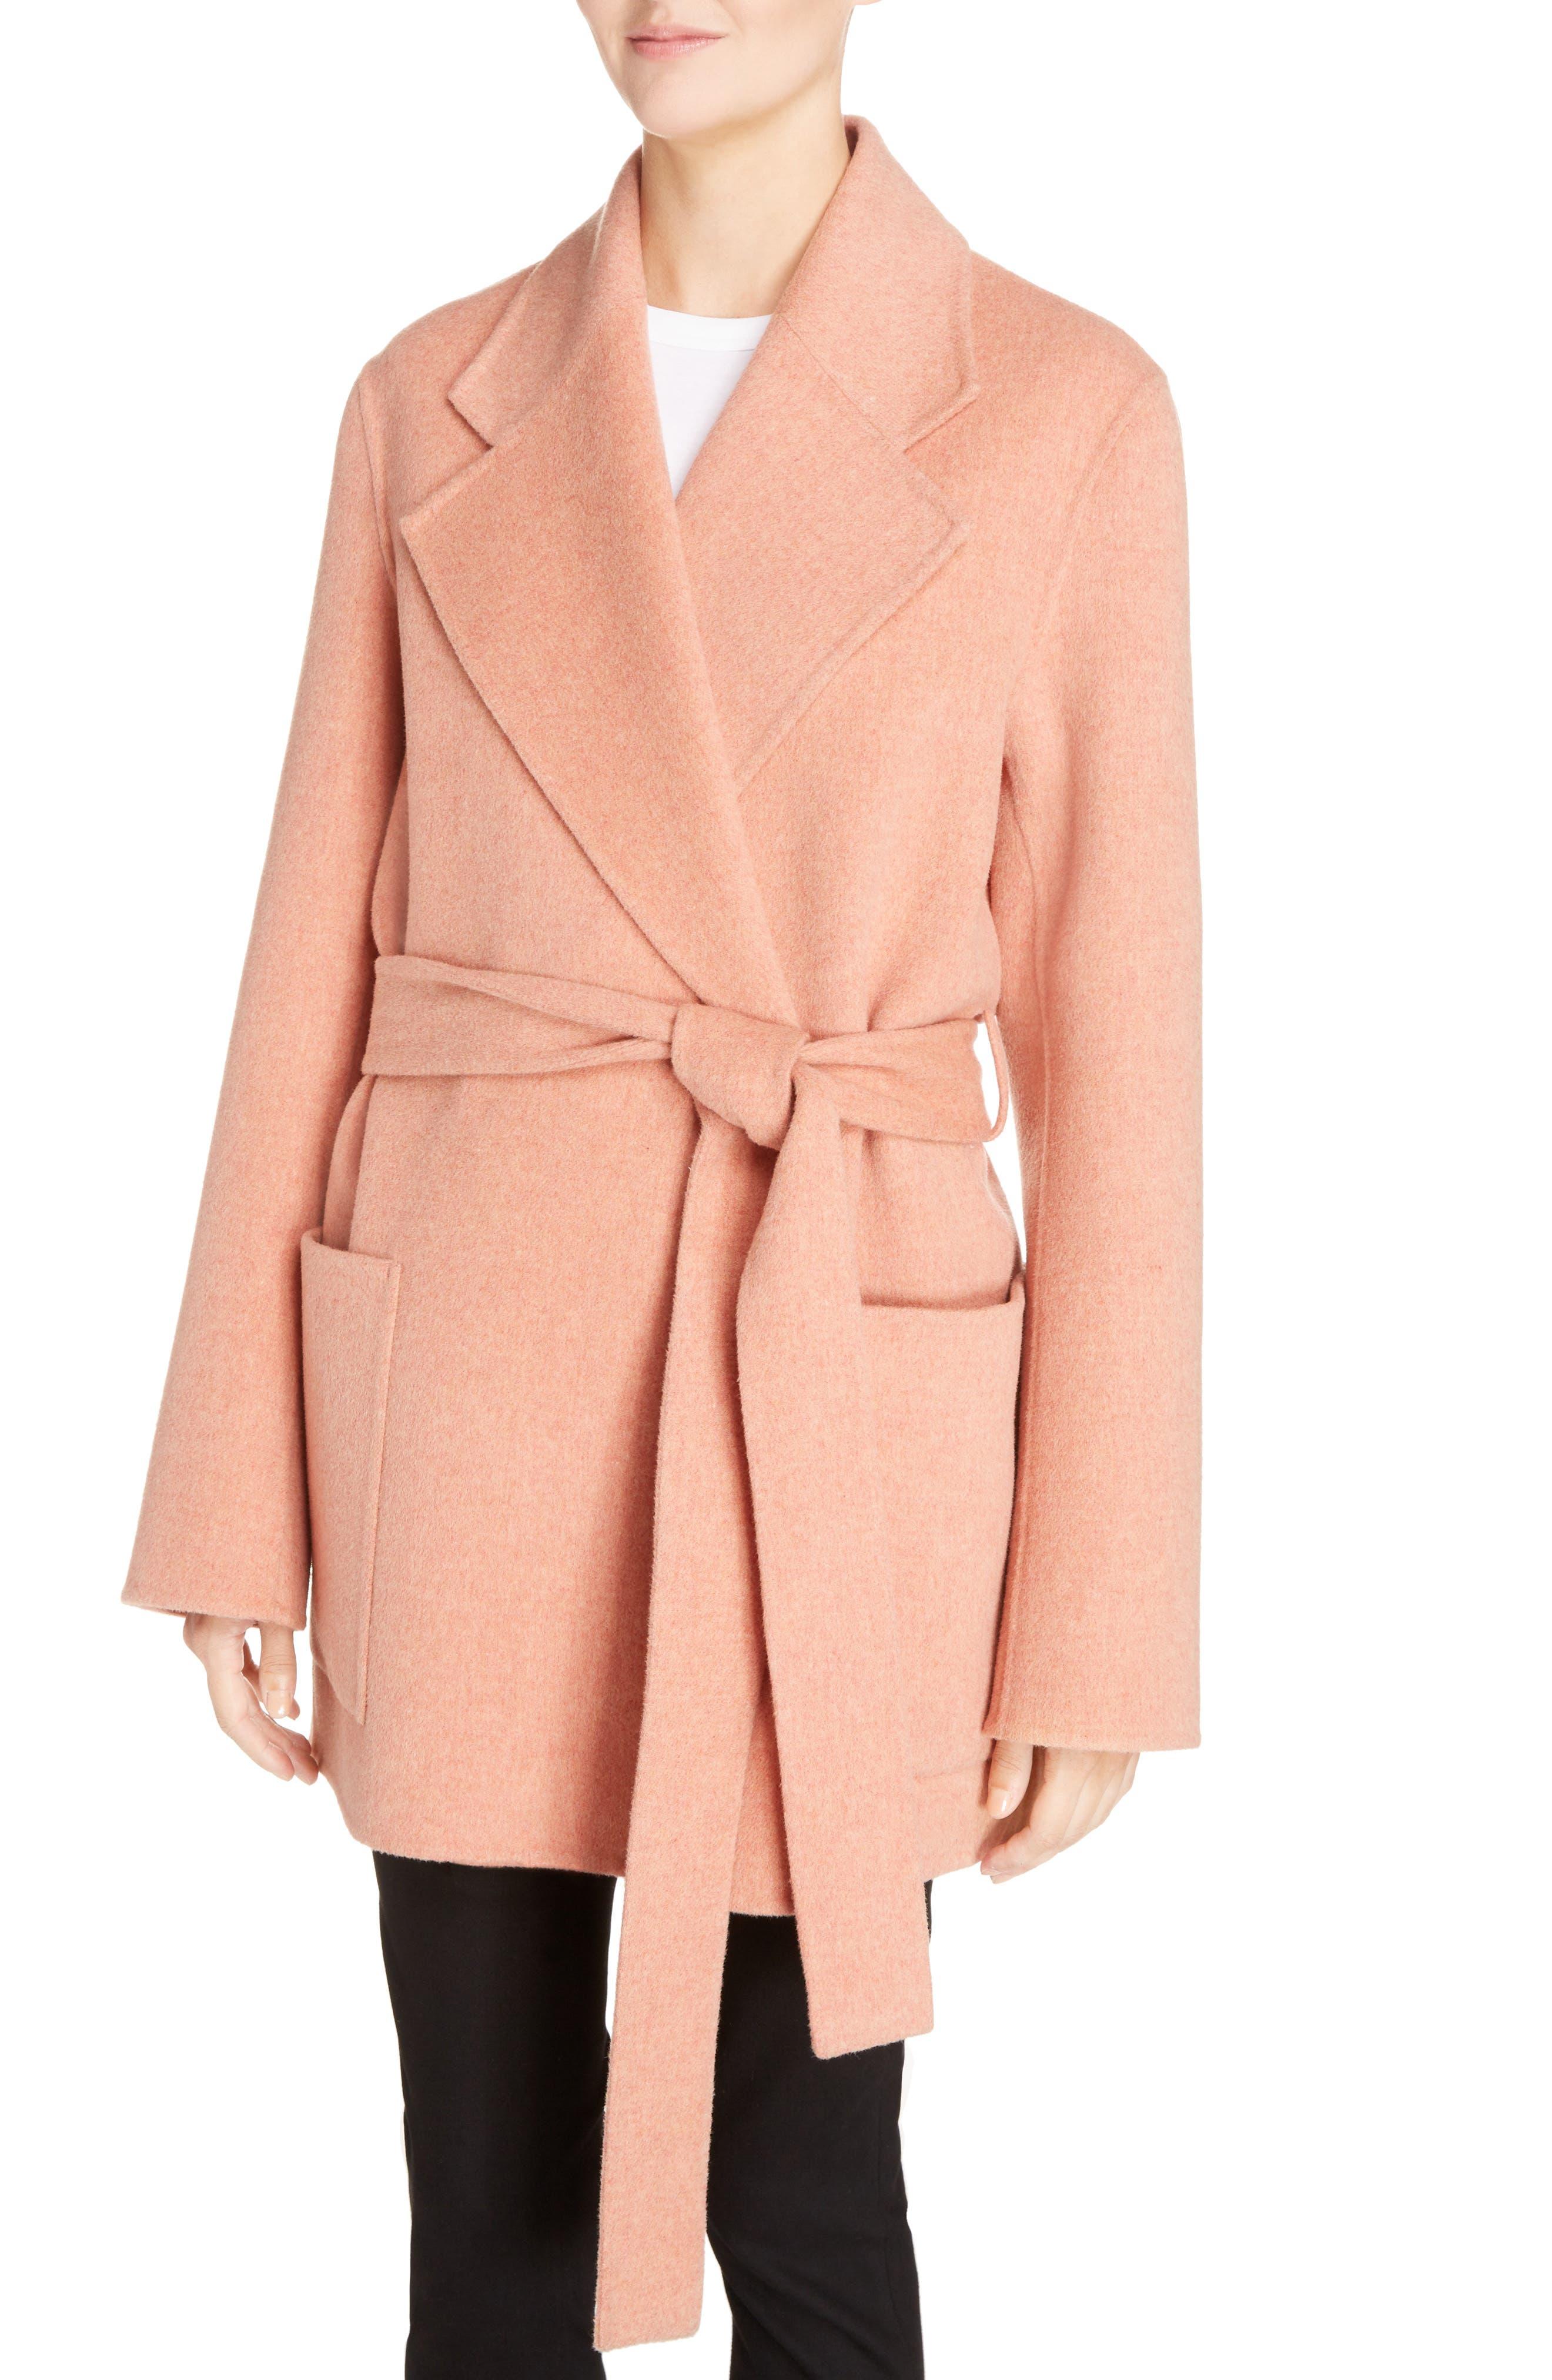 Anika Doublé Wool & Cashmere Coat,                             Alternate thumbnail 4, color,                             650